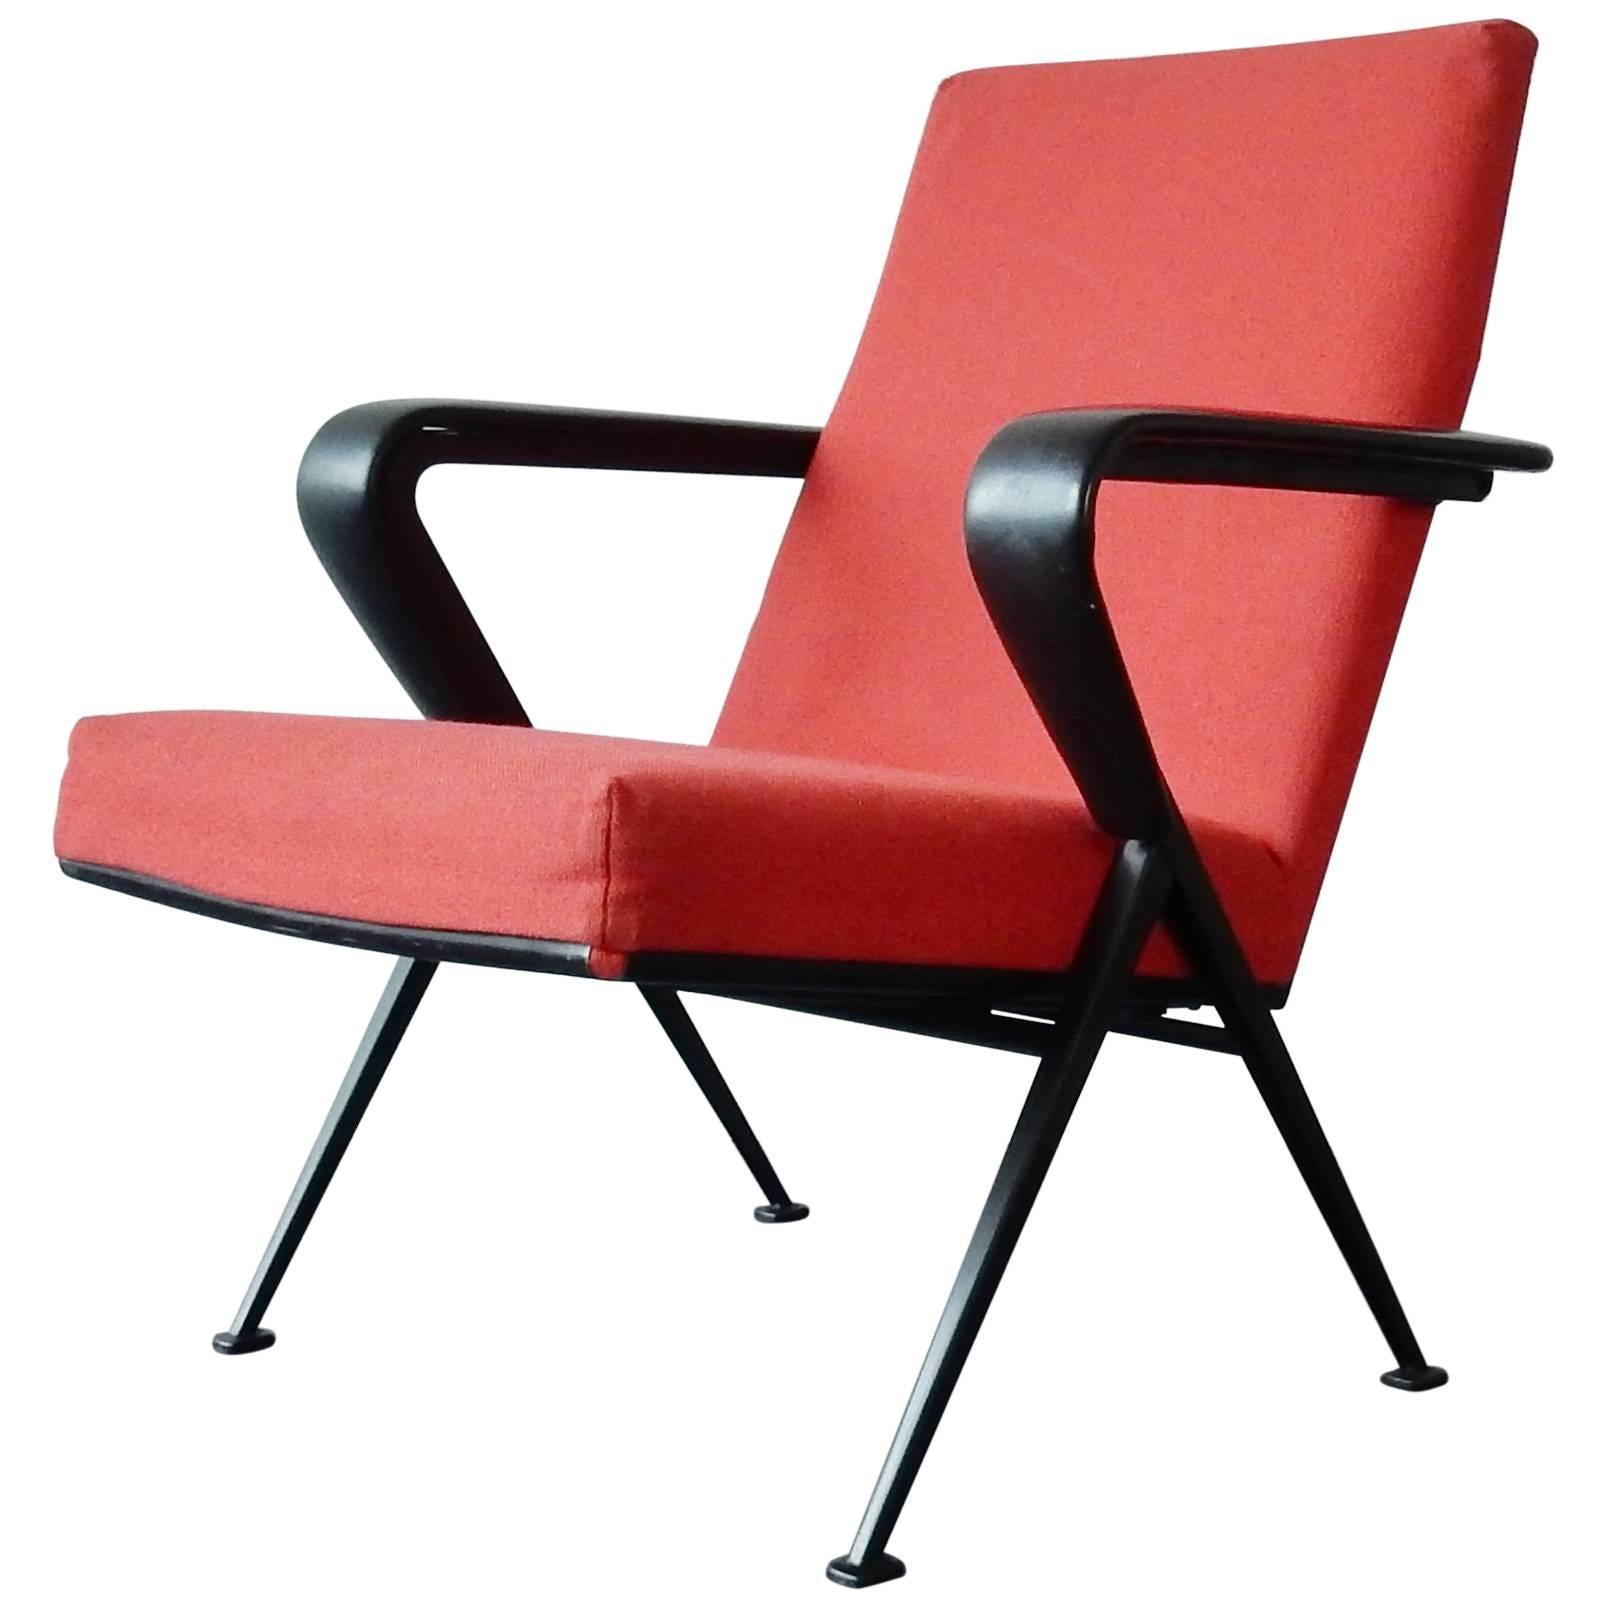 Model 'Repose' Armchair by Friso Kramer for Ahrend de Cirkel, Netherlands, 1965